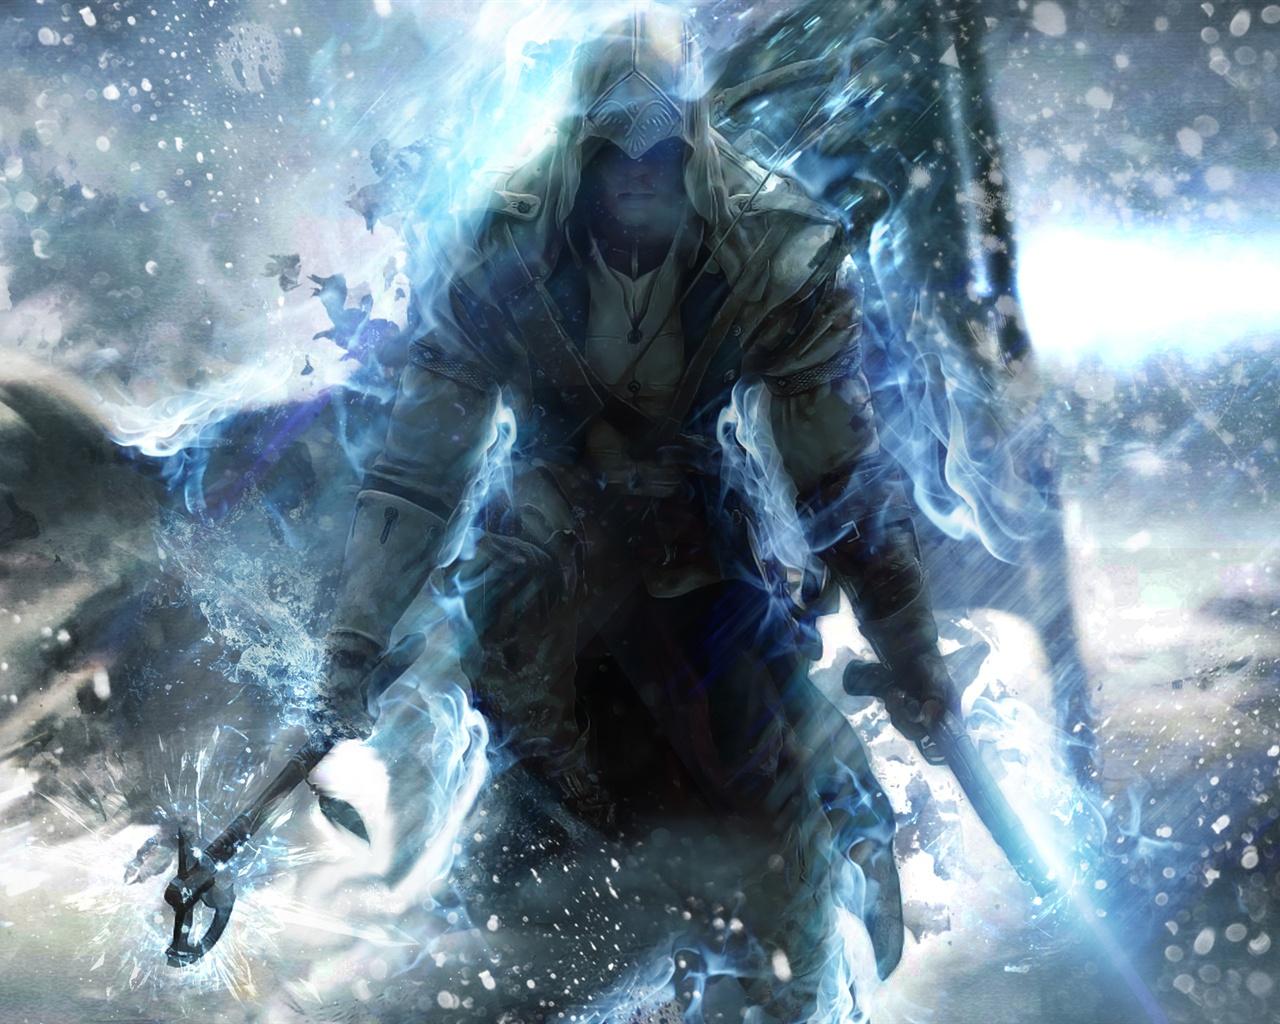 Creed Assassins Creed 3 blaue Stil Hintergrundbilder 1280x1024 1280x1024